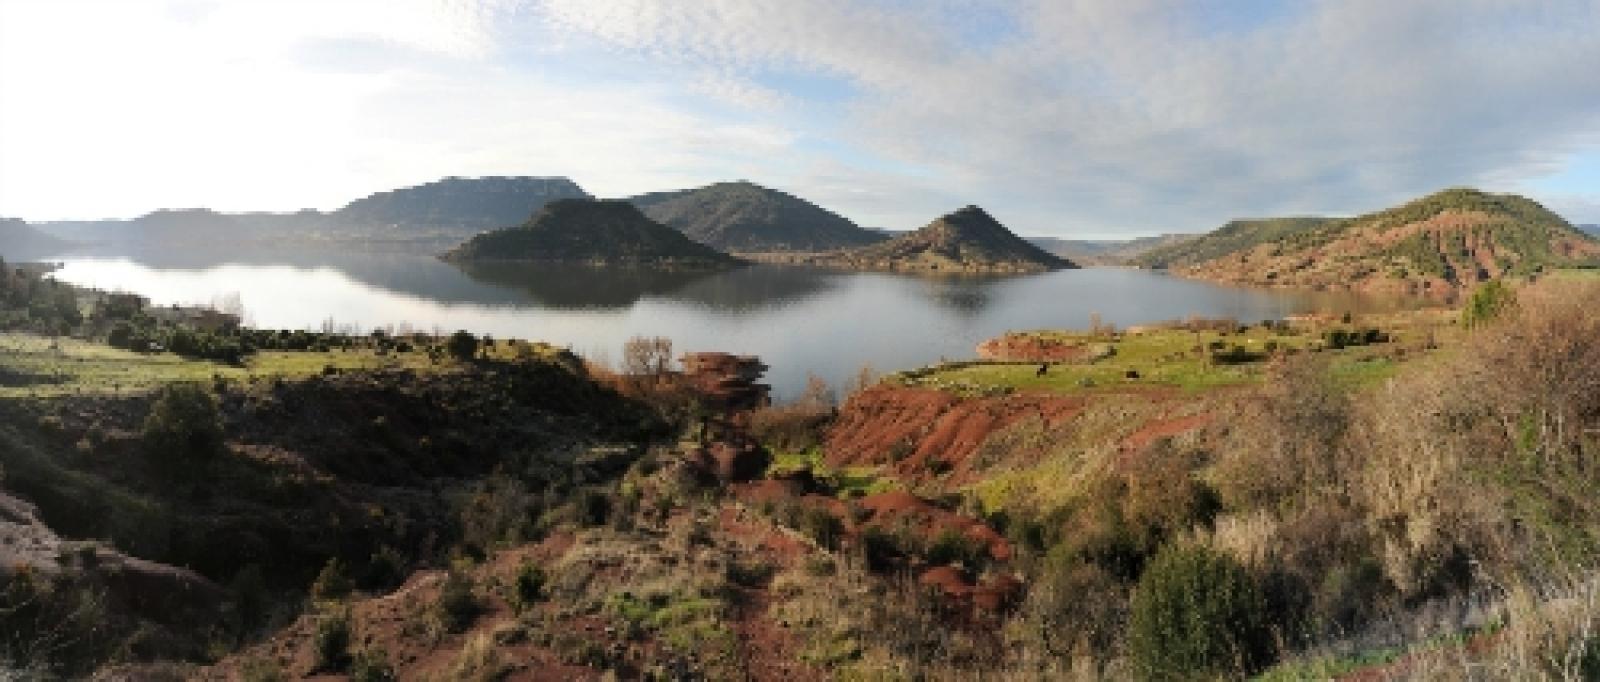 El lago de Salagou